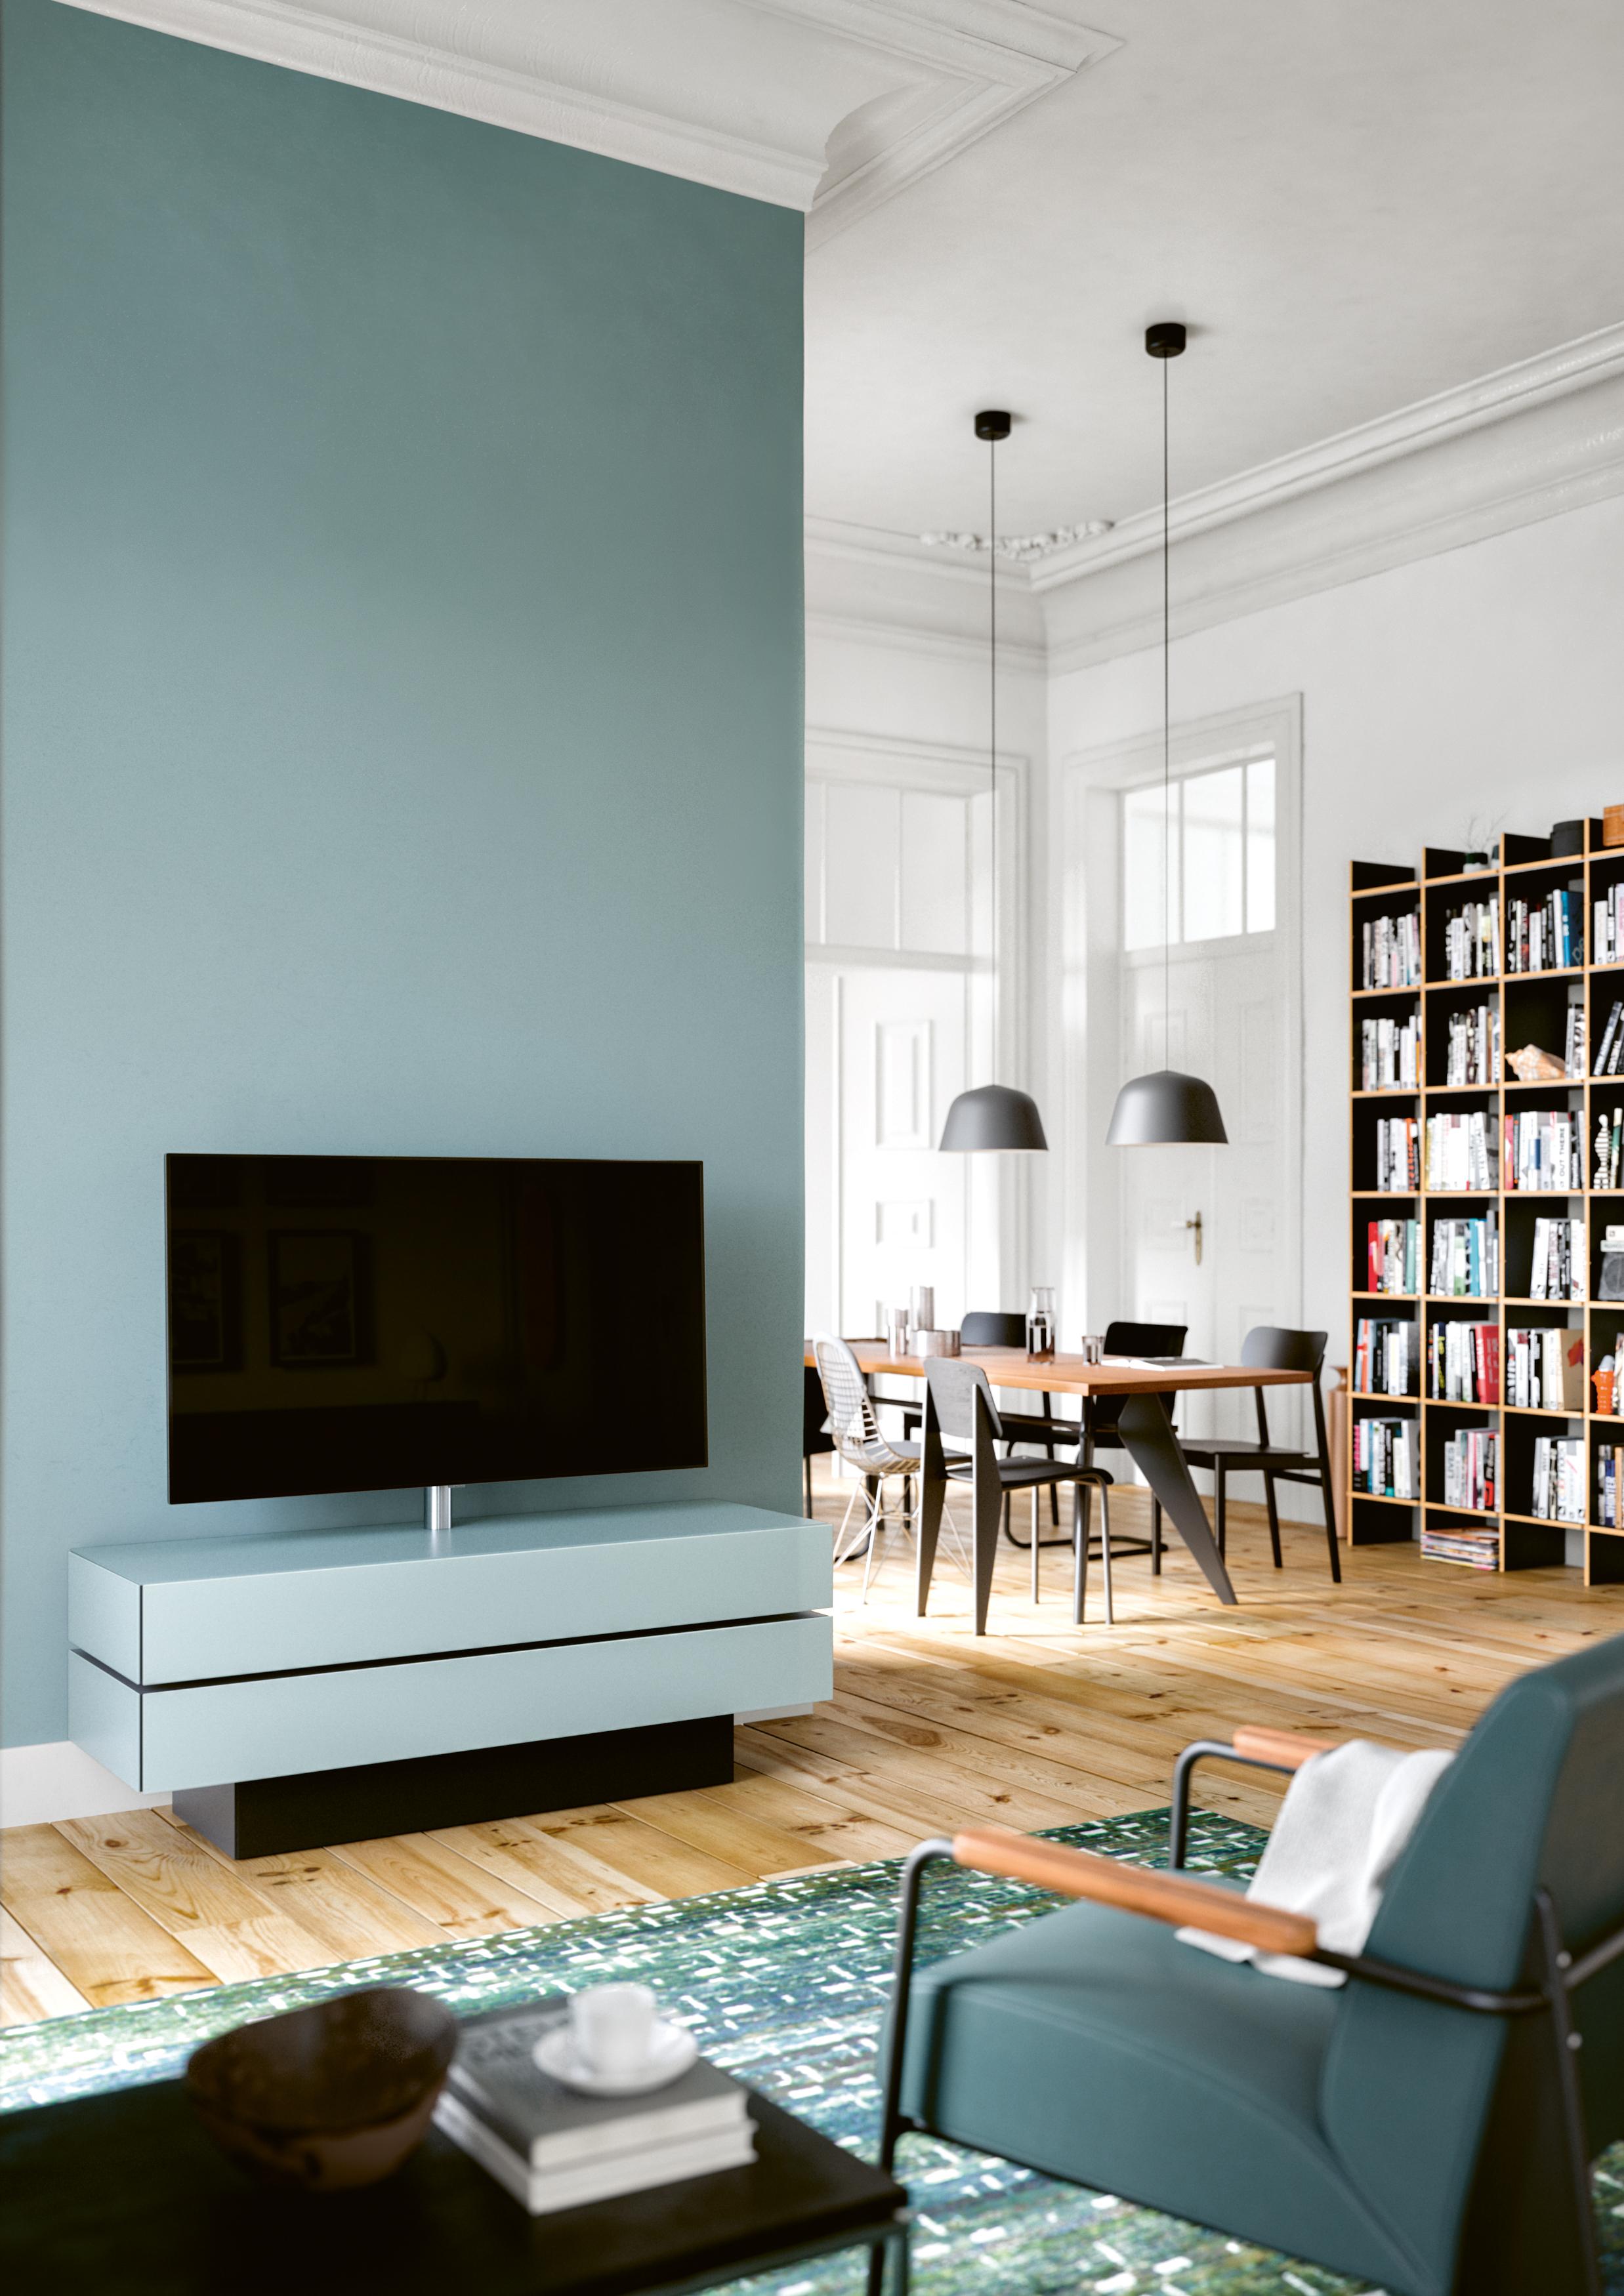 Meuble Tv Hifi Intégré spectral brick br1503 meuble tv - hi-fi, home-cinéma, salle